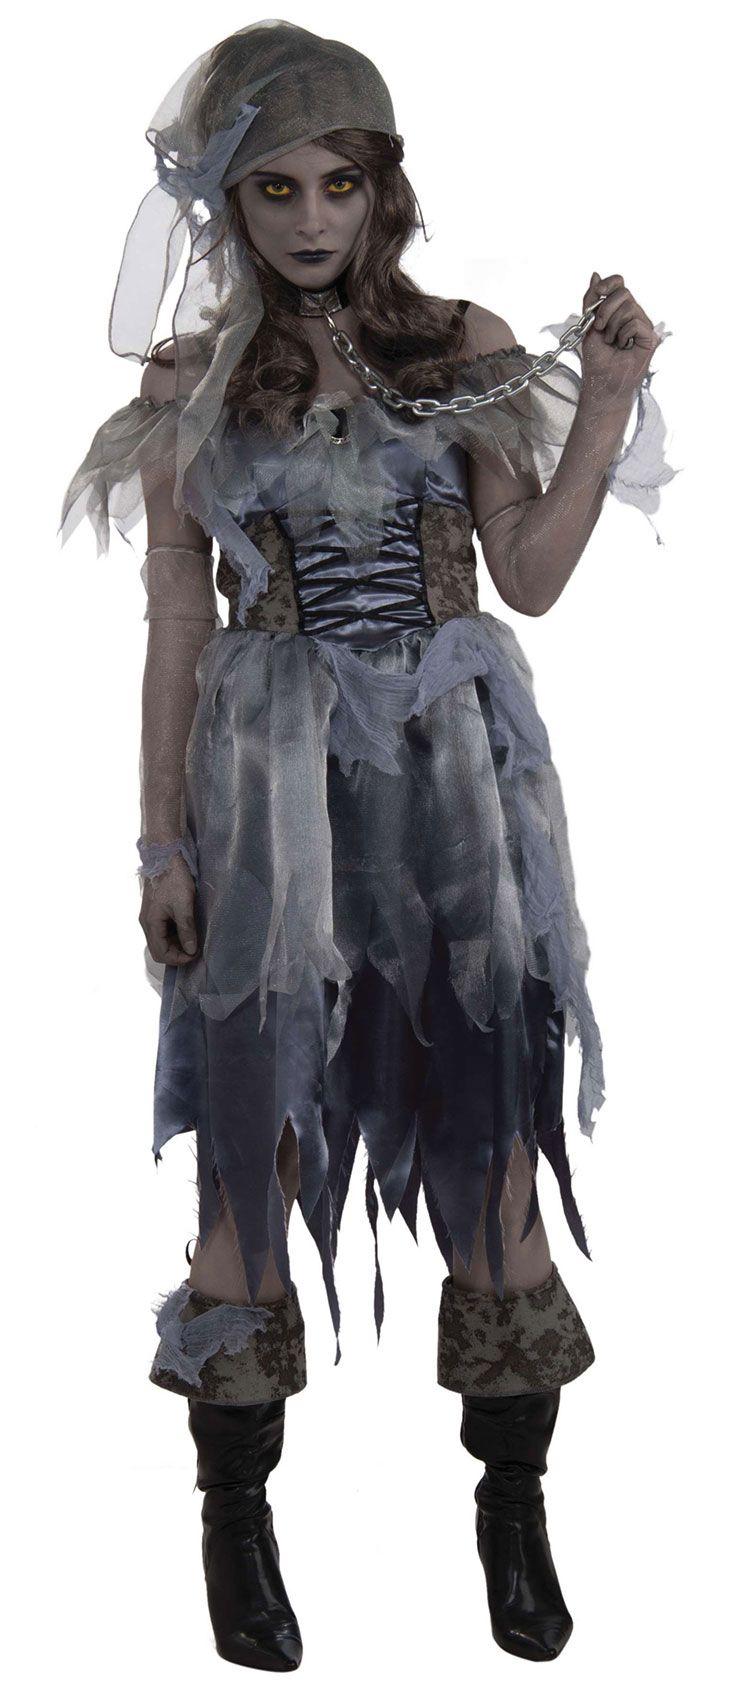 Lady Pirate Zombie Costume | Costumes & Make up | Pinterest ...